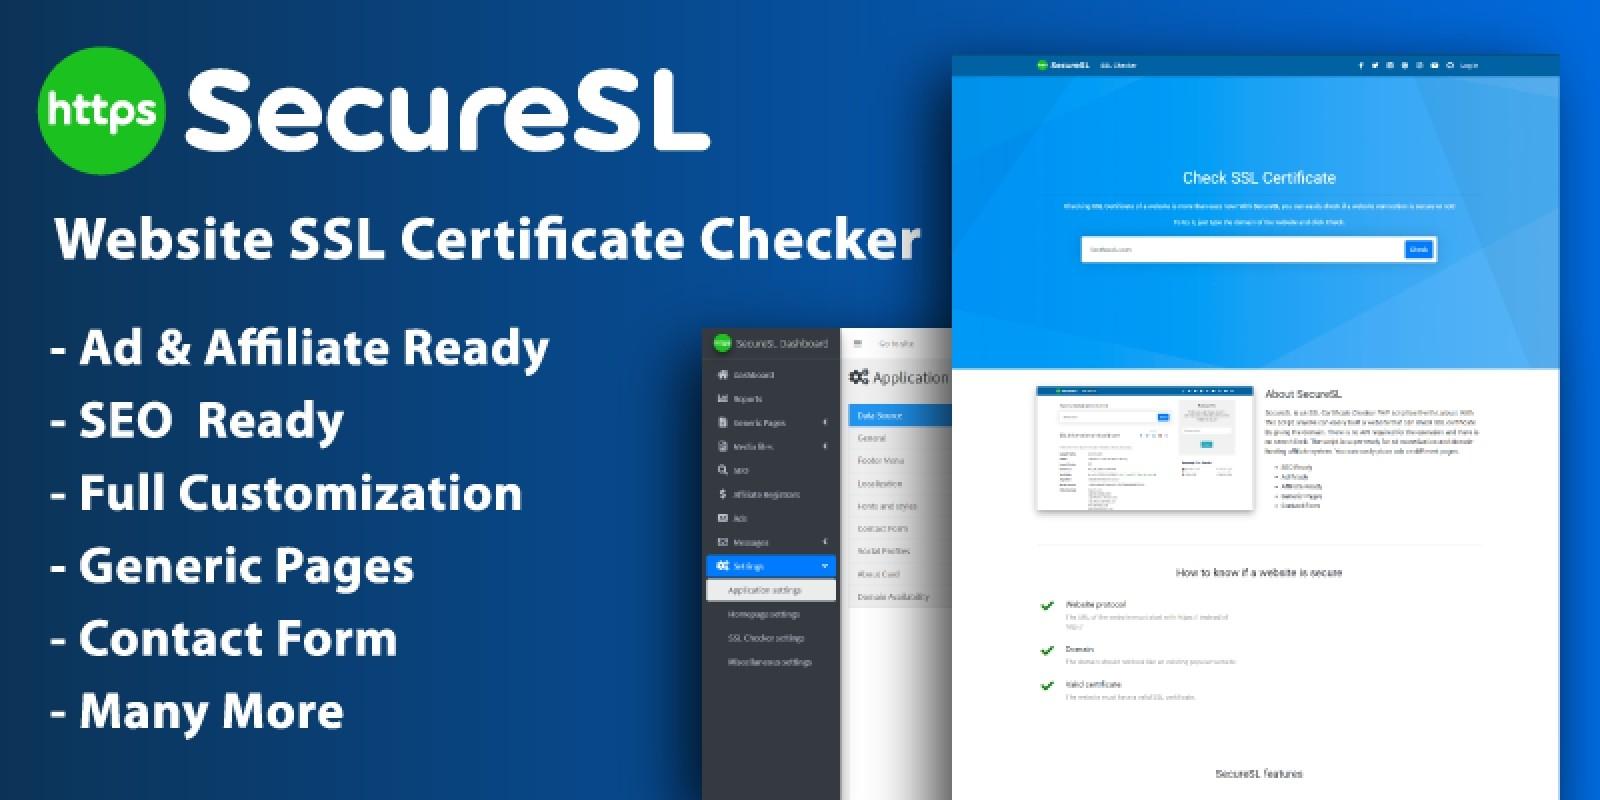 SecureSL - Website SSL Certificate Checker Script